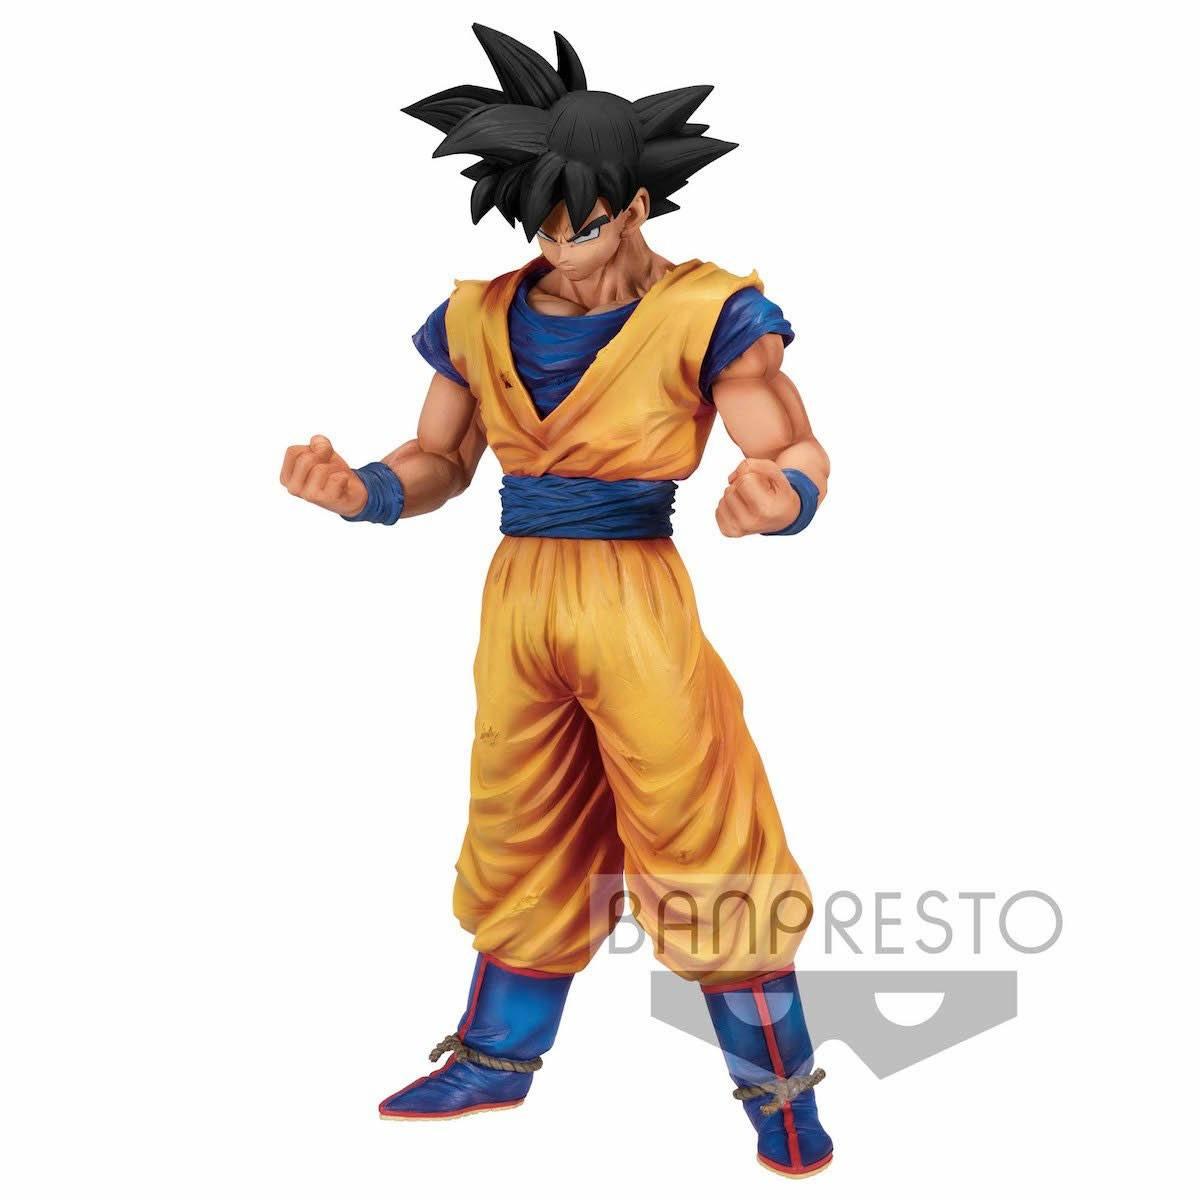 Dragonball Z Grandista Resolution of Soldiers Figure Son Goku Ver. 2 28 cm